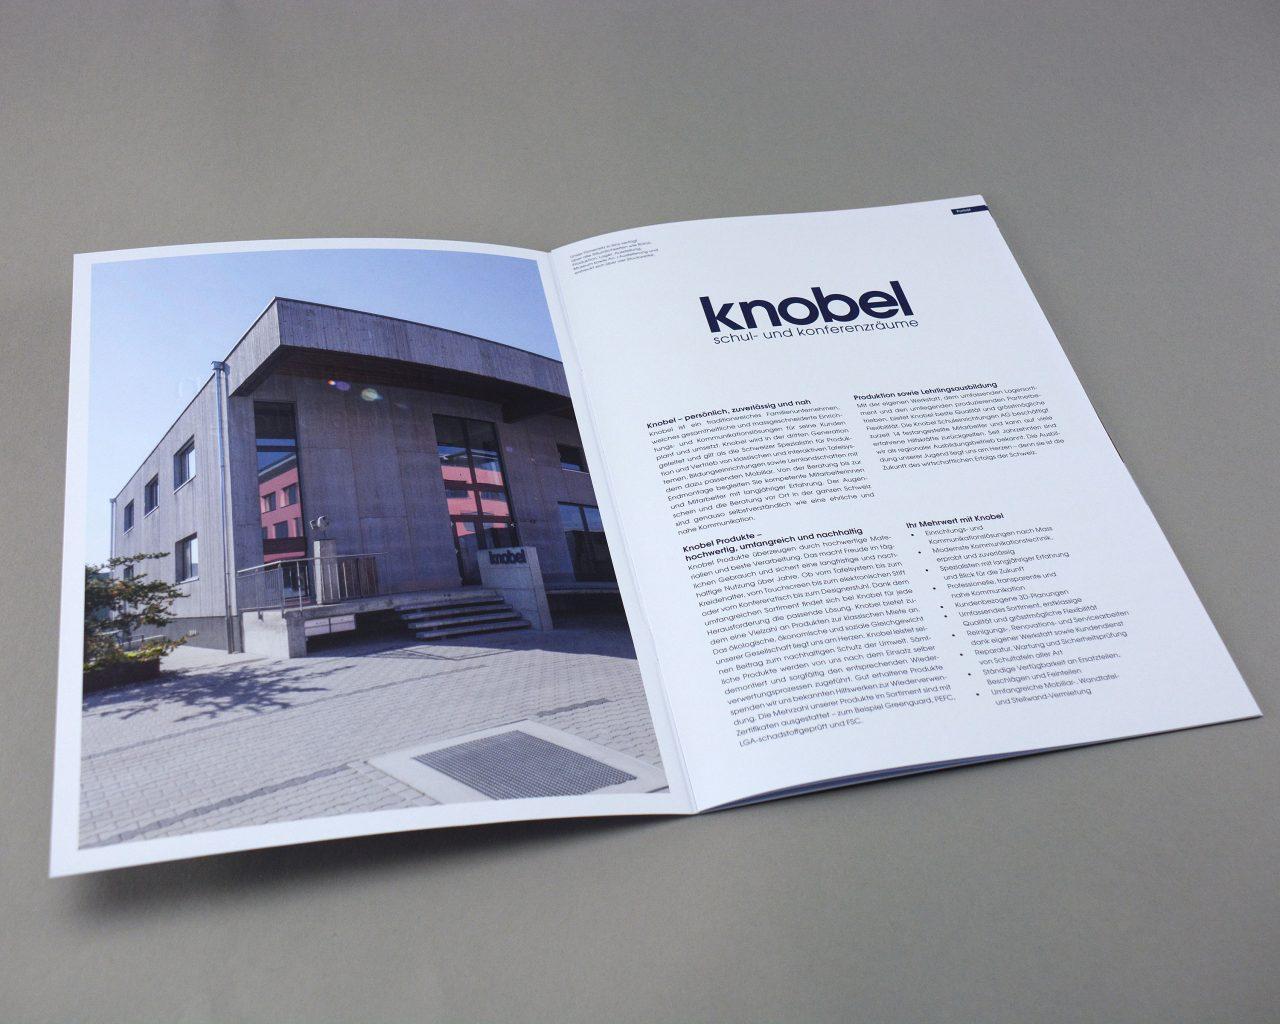 knobel02